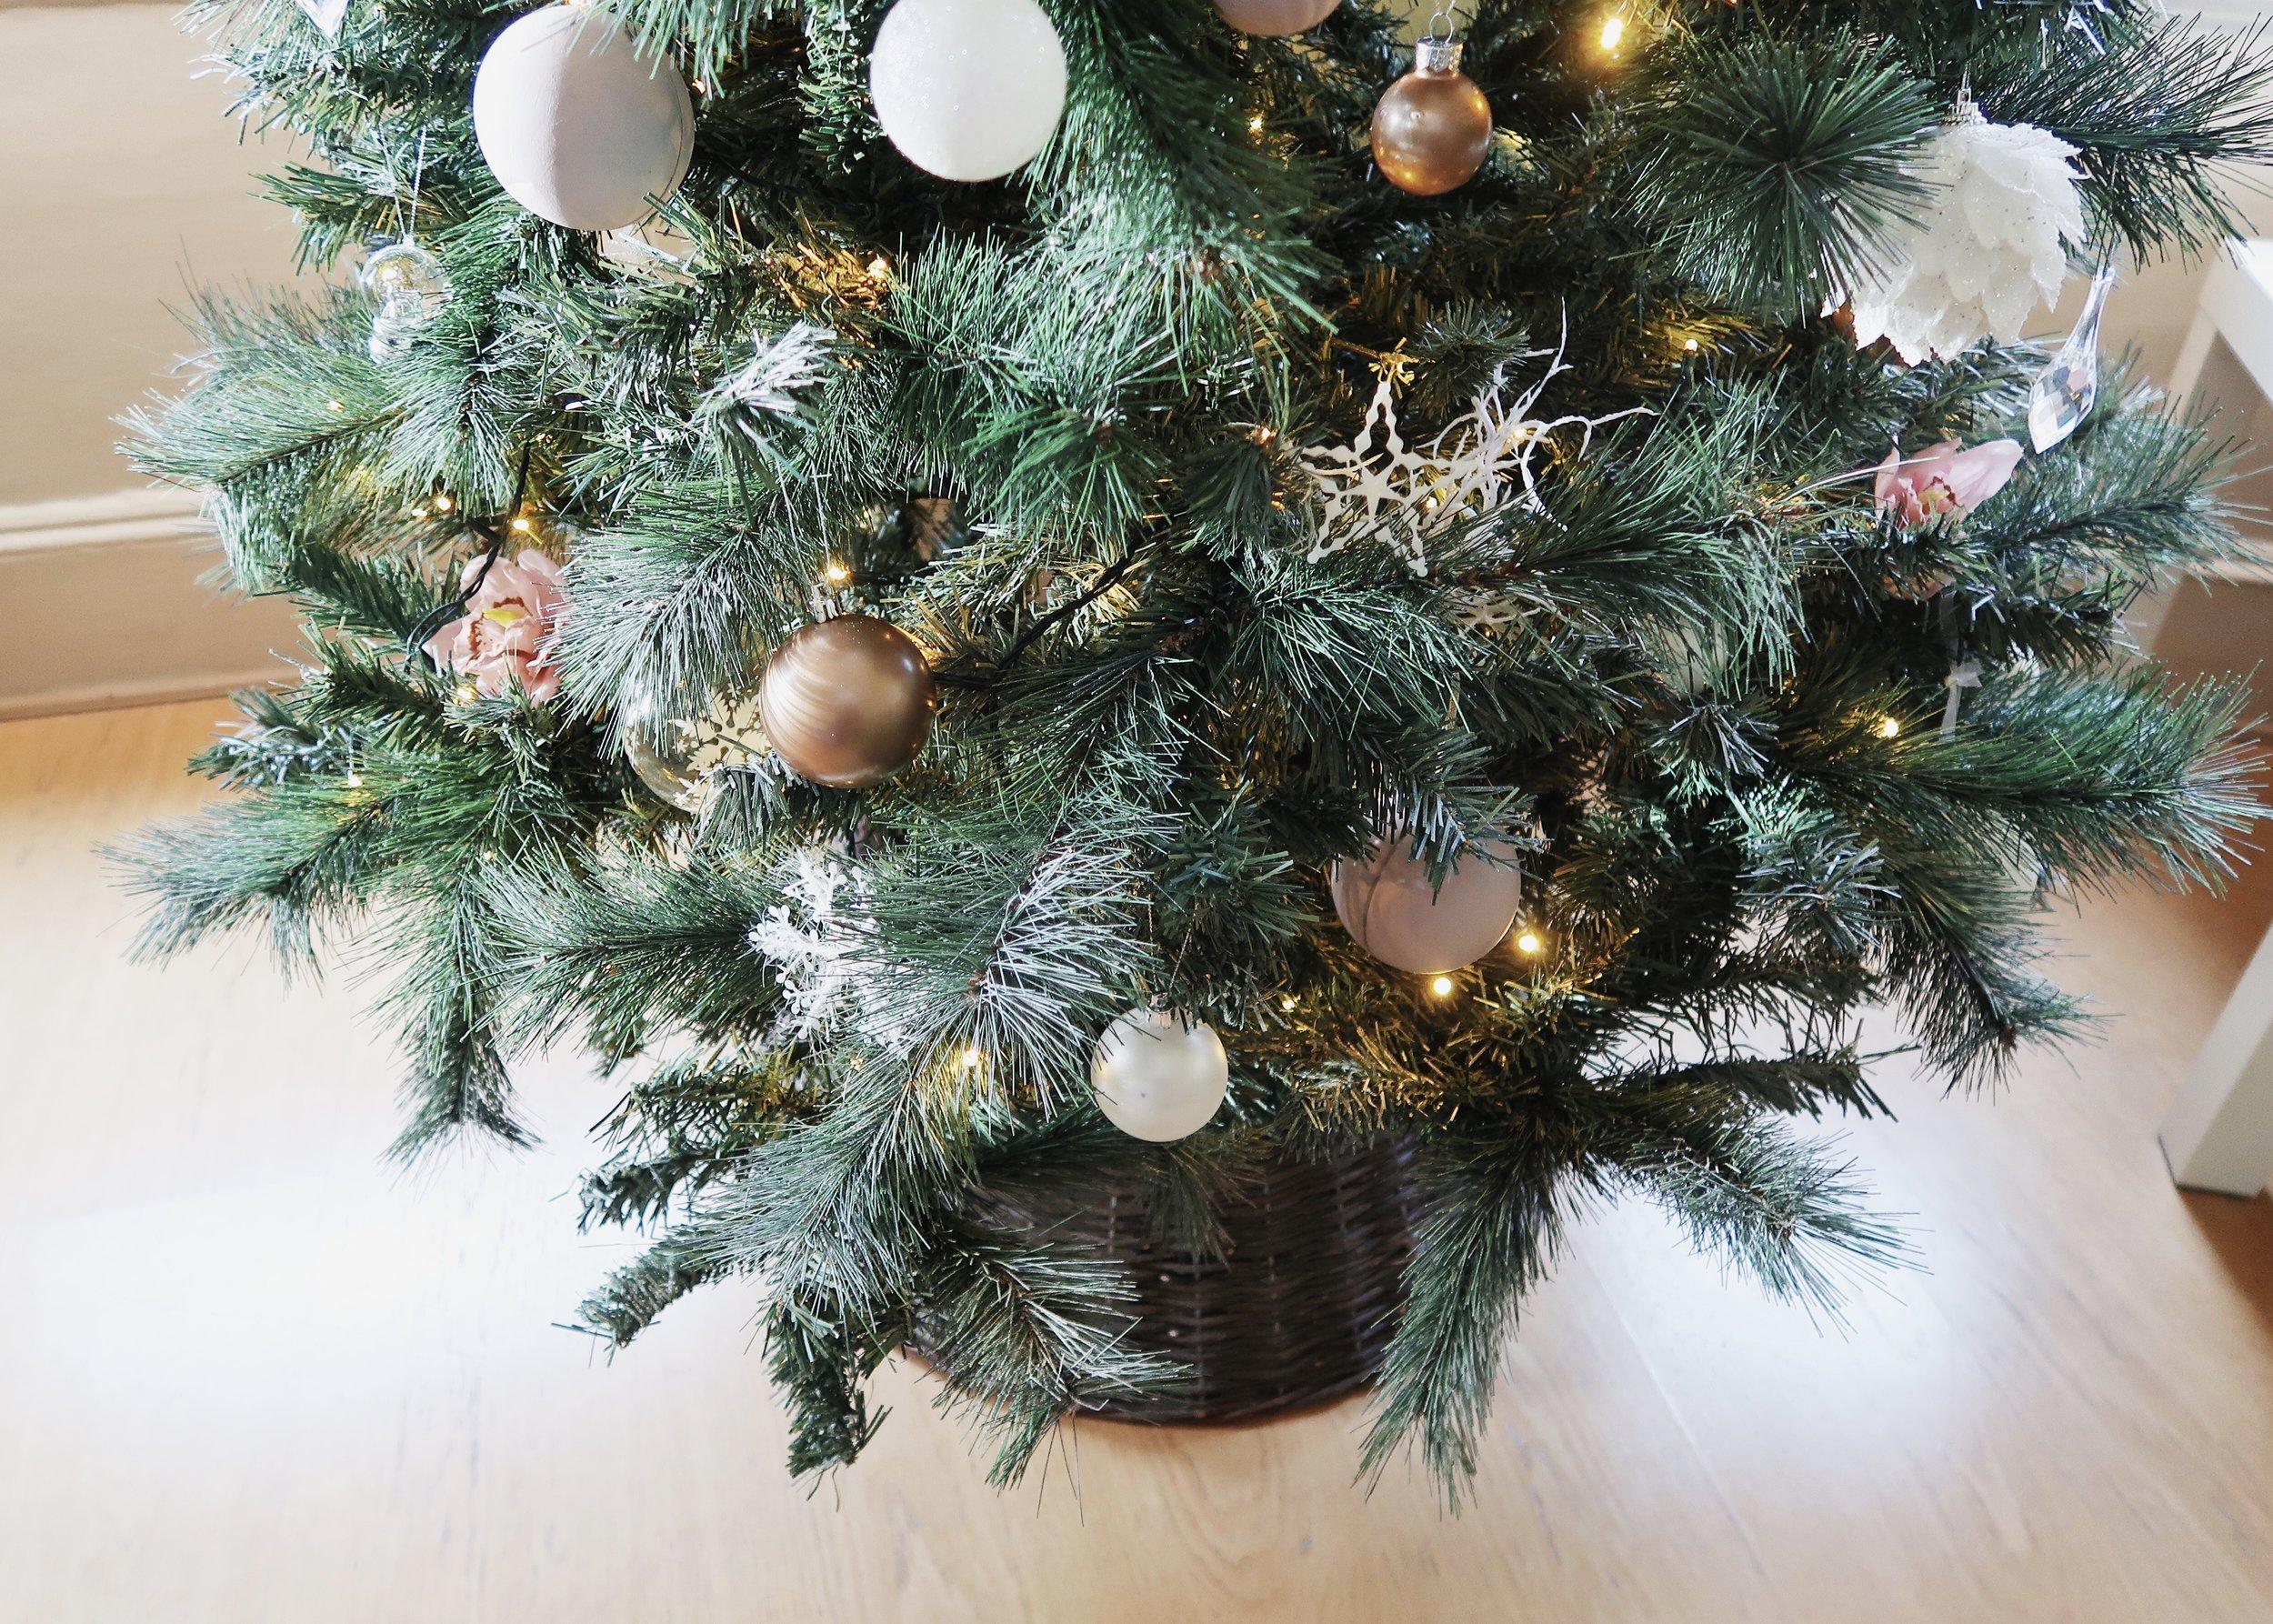 Christmas Decor on a Budget by Isoscella